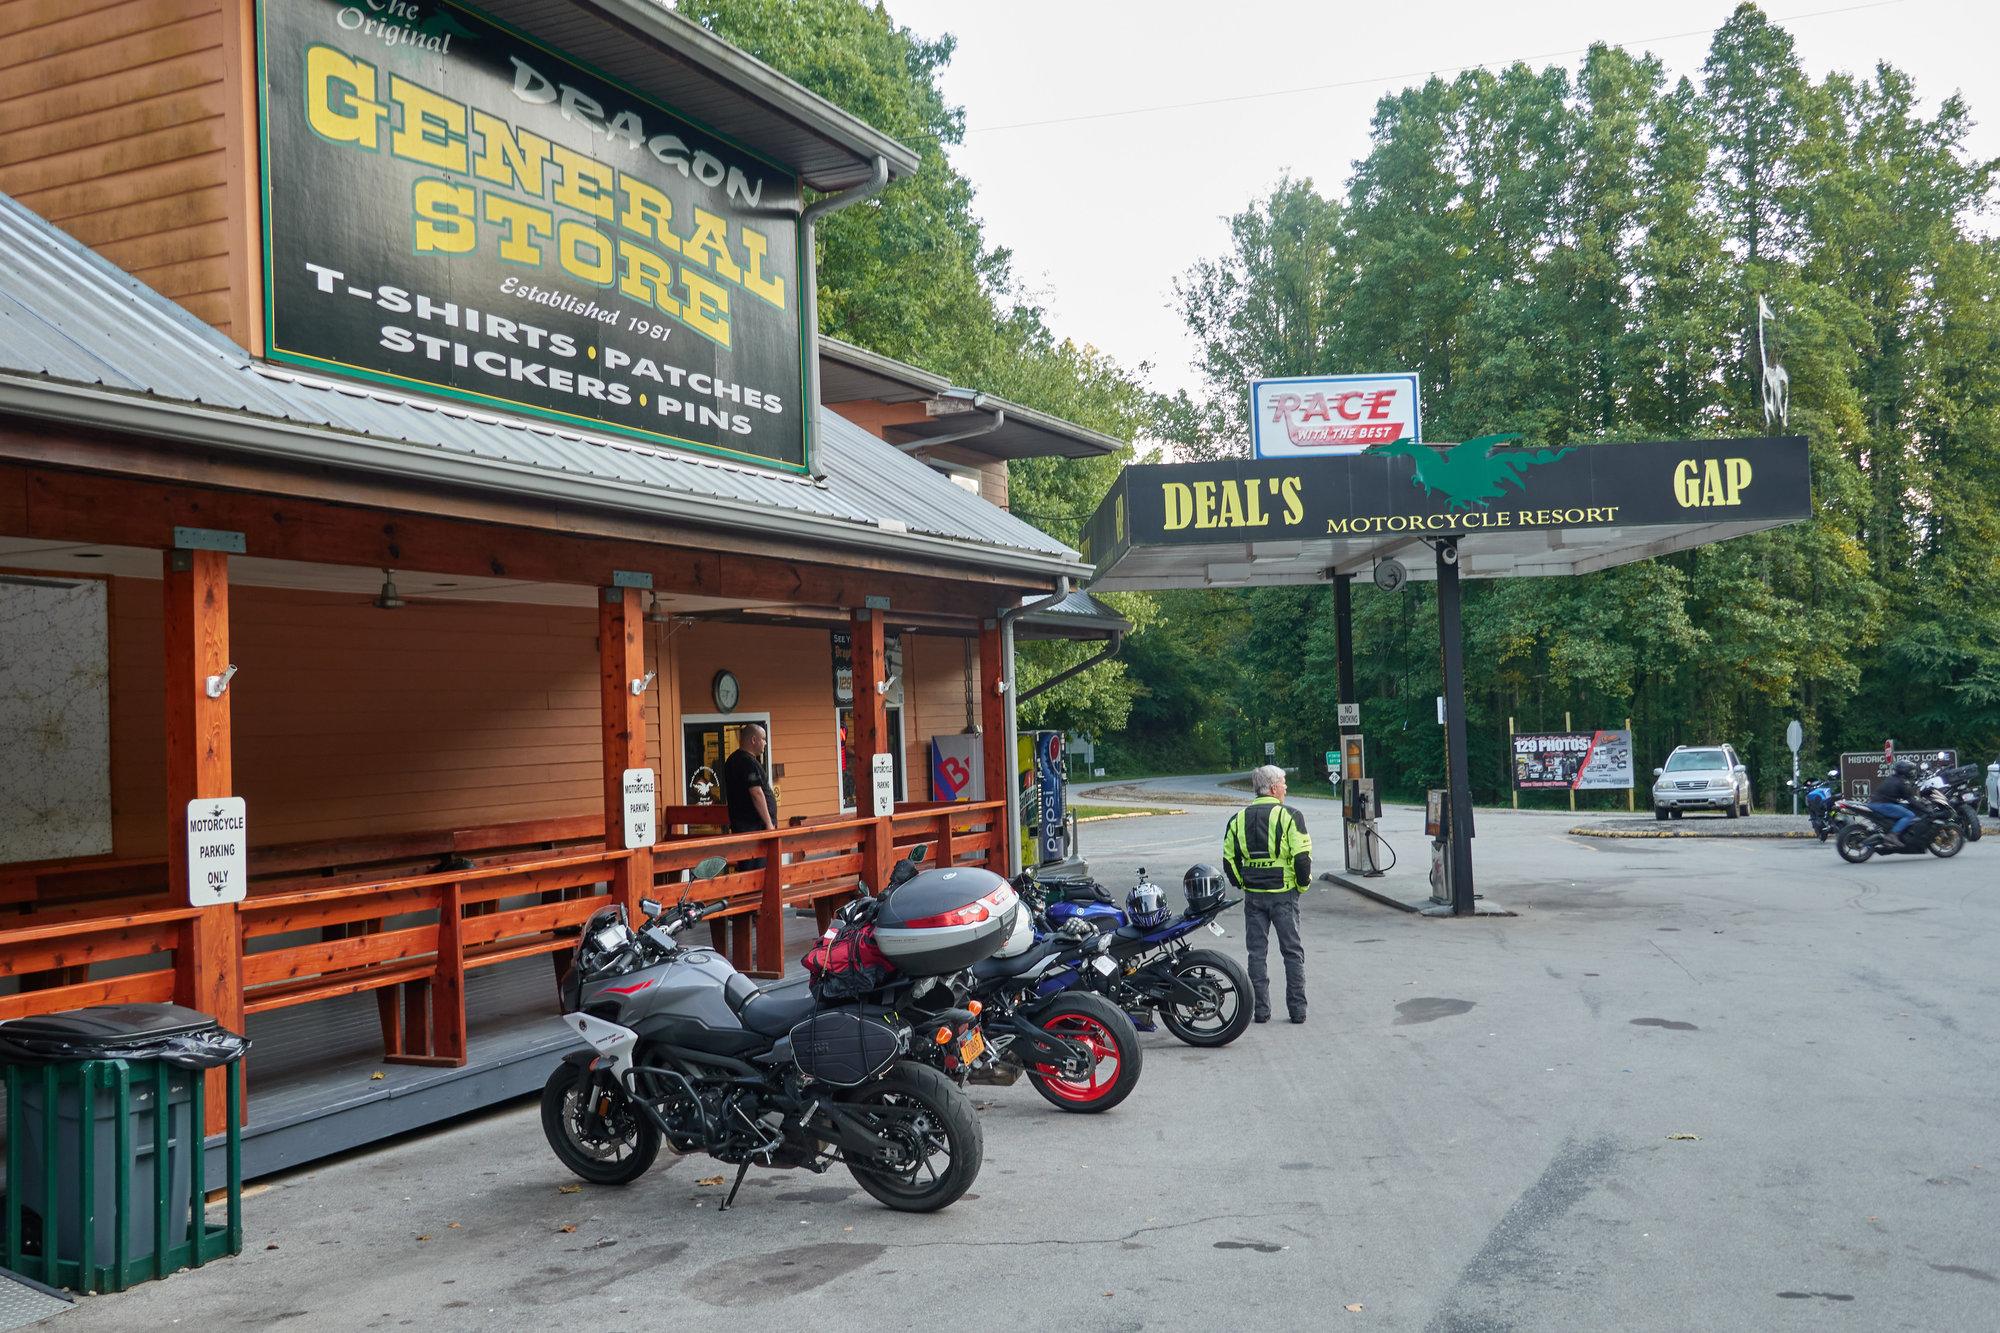 NYC_to_Yellowstone_Sep 27 2020_DSC02865_ .jpg